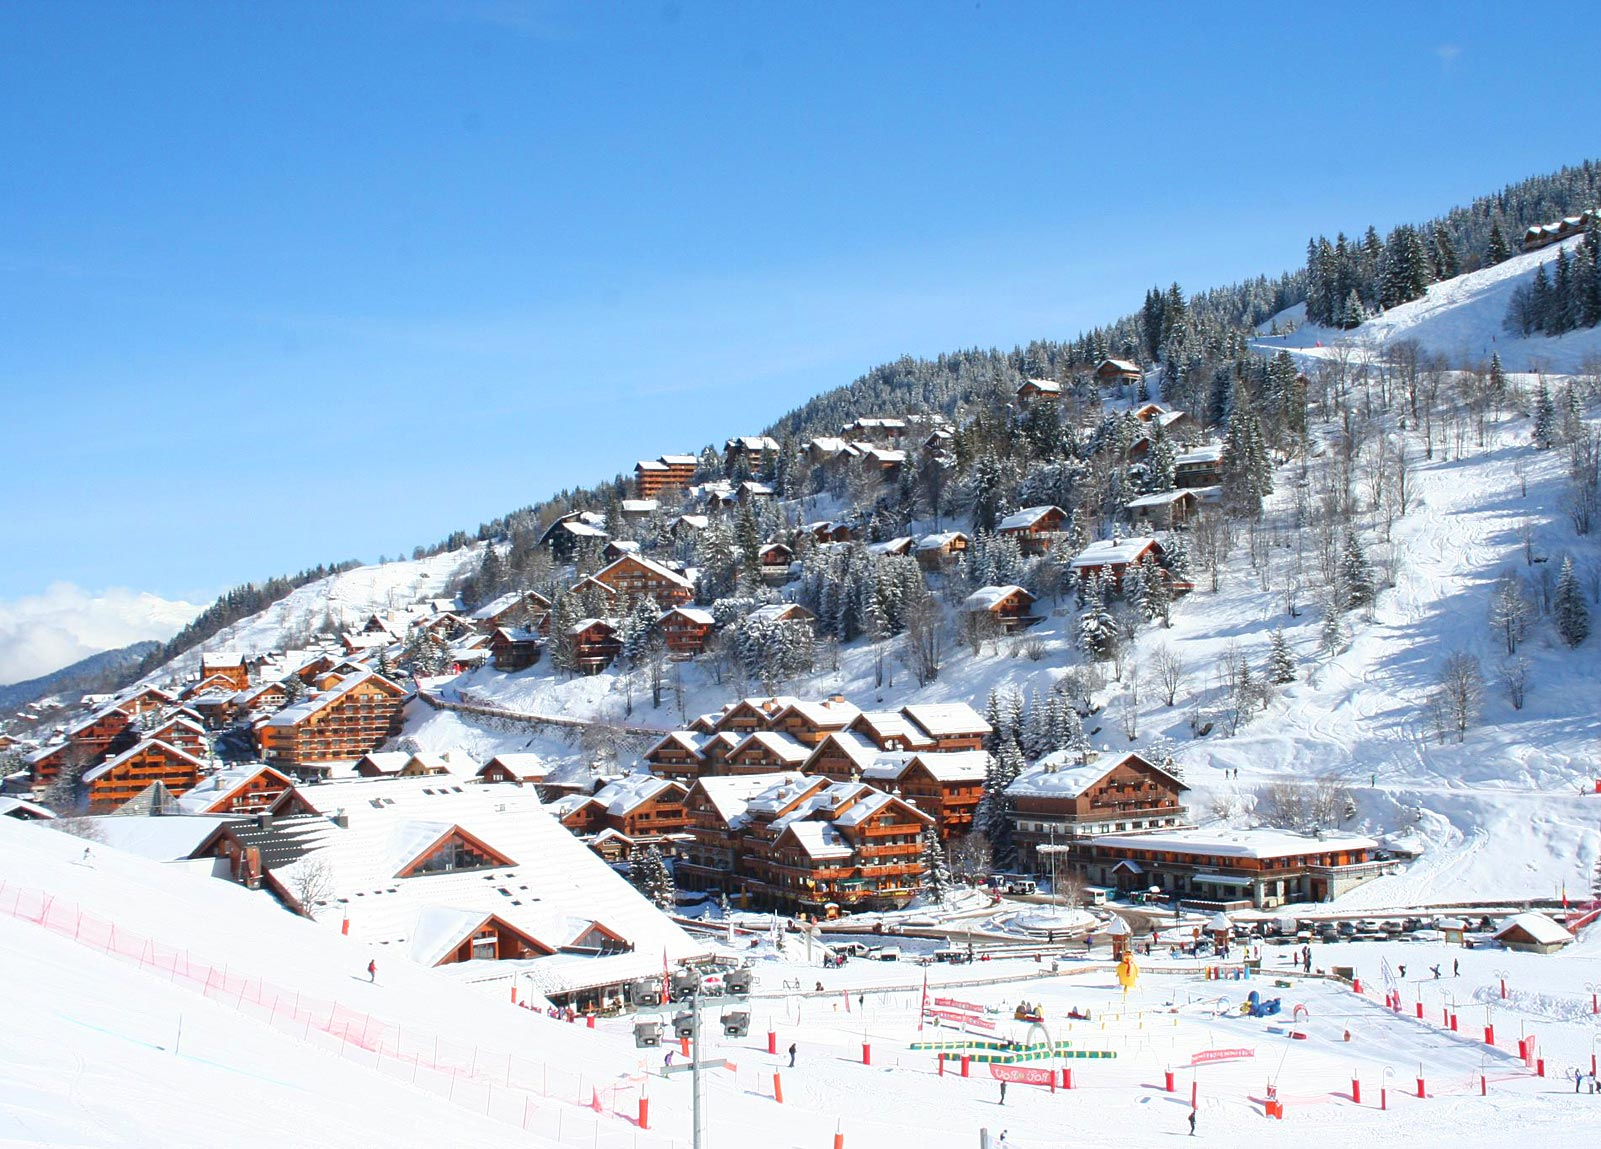 3 Valleys France  Les 3 Vallees Ski Resort  Worlds